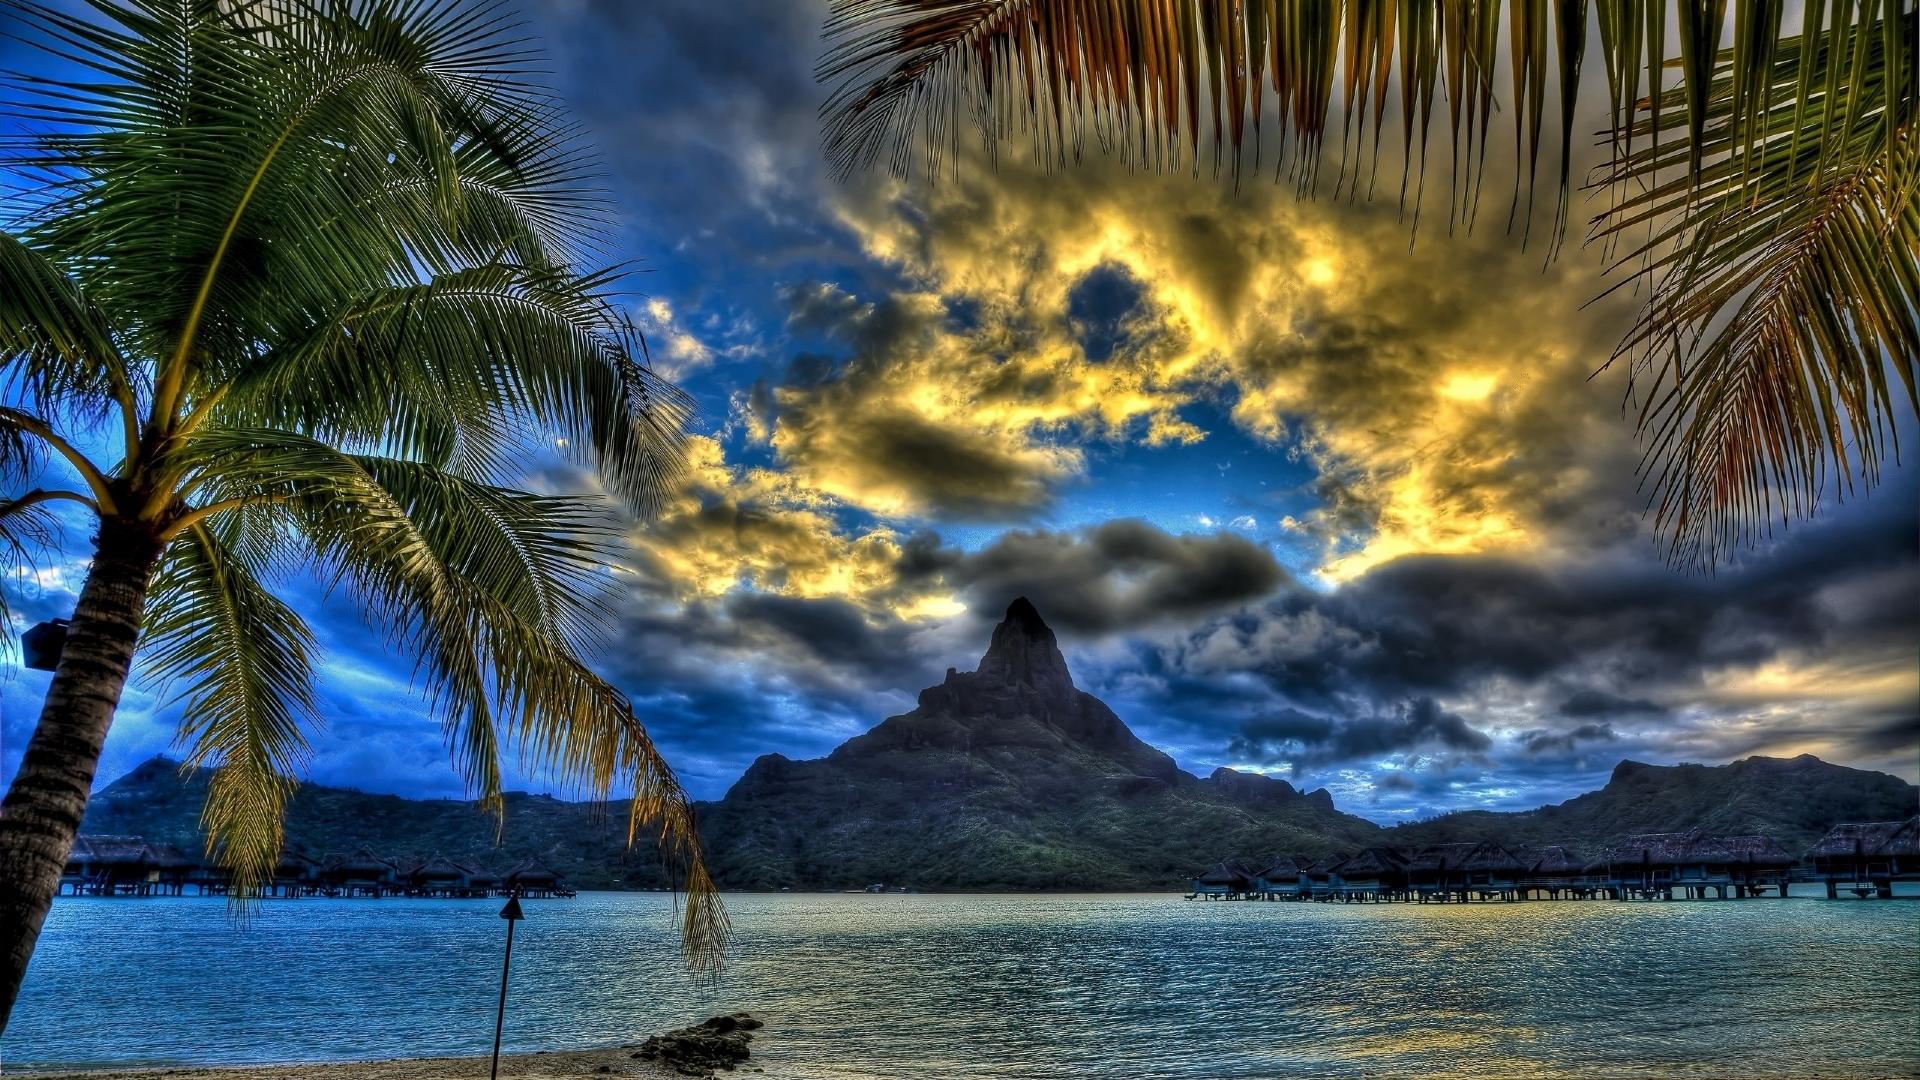 Hd scenery wallpaper - Hd photos of scenery ...